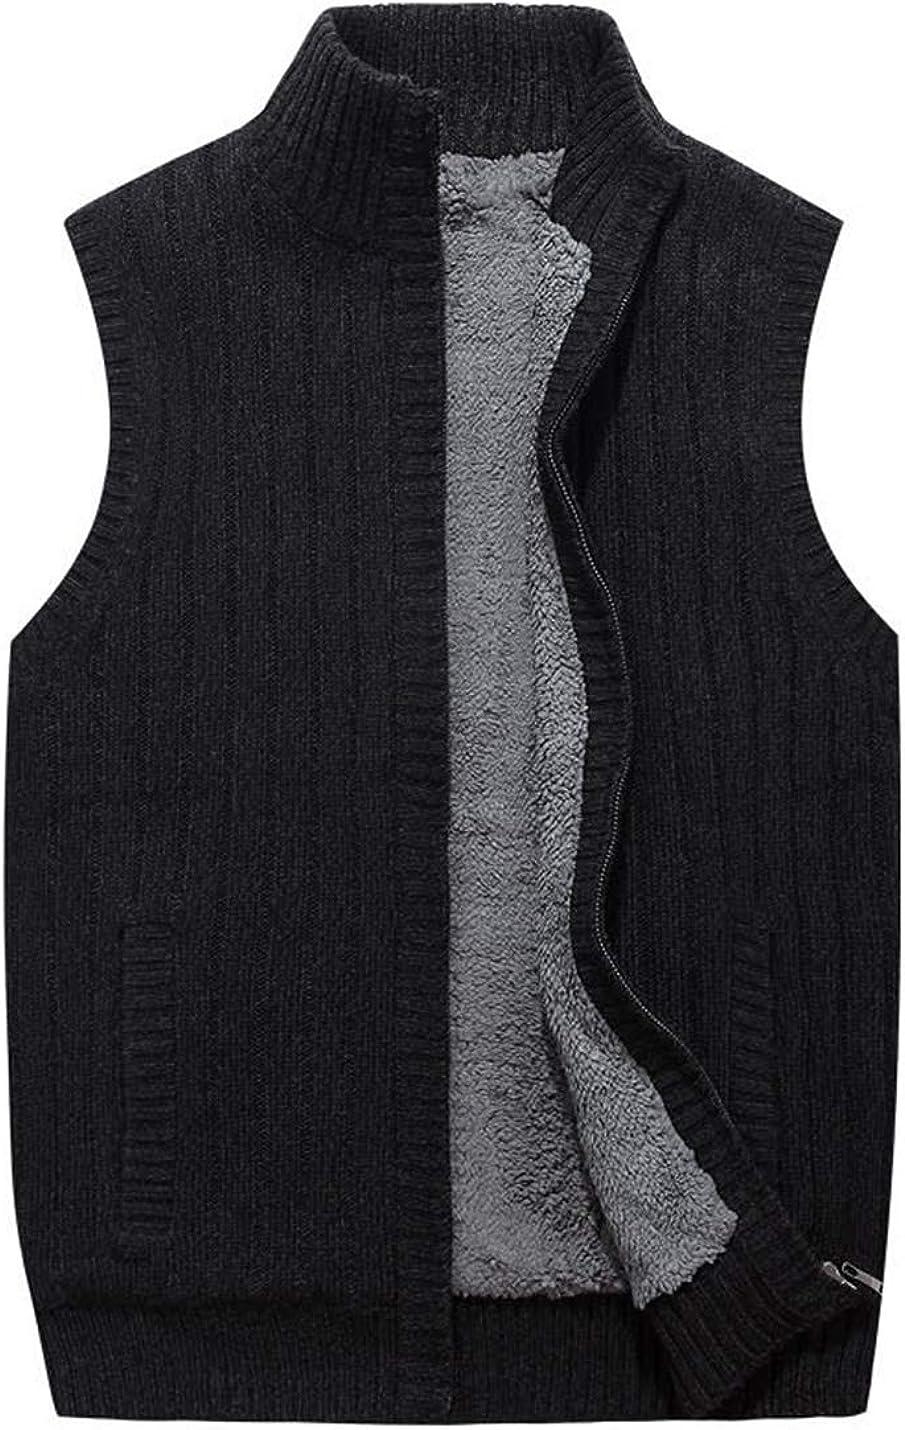 Lentta Men's Chunky Baggy Stand Collar Zip Sleeveless Cable Knit Fleece Vest Sweater